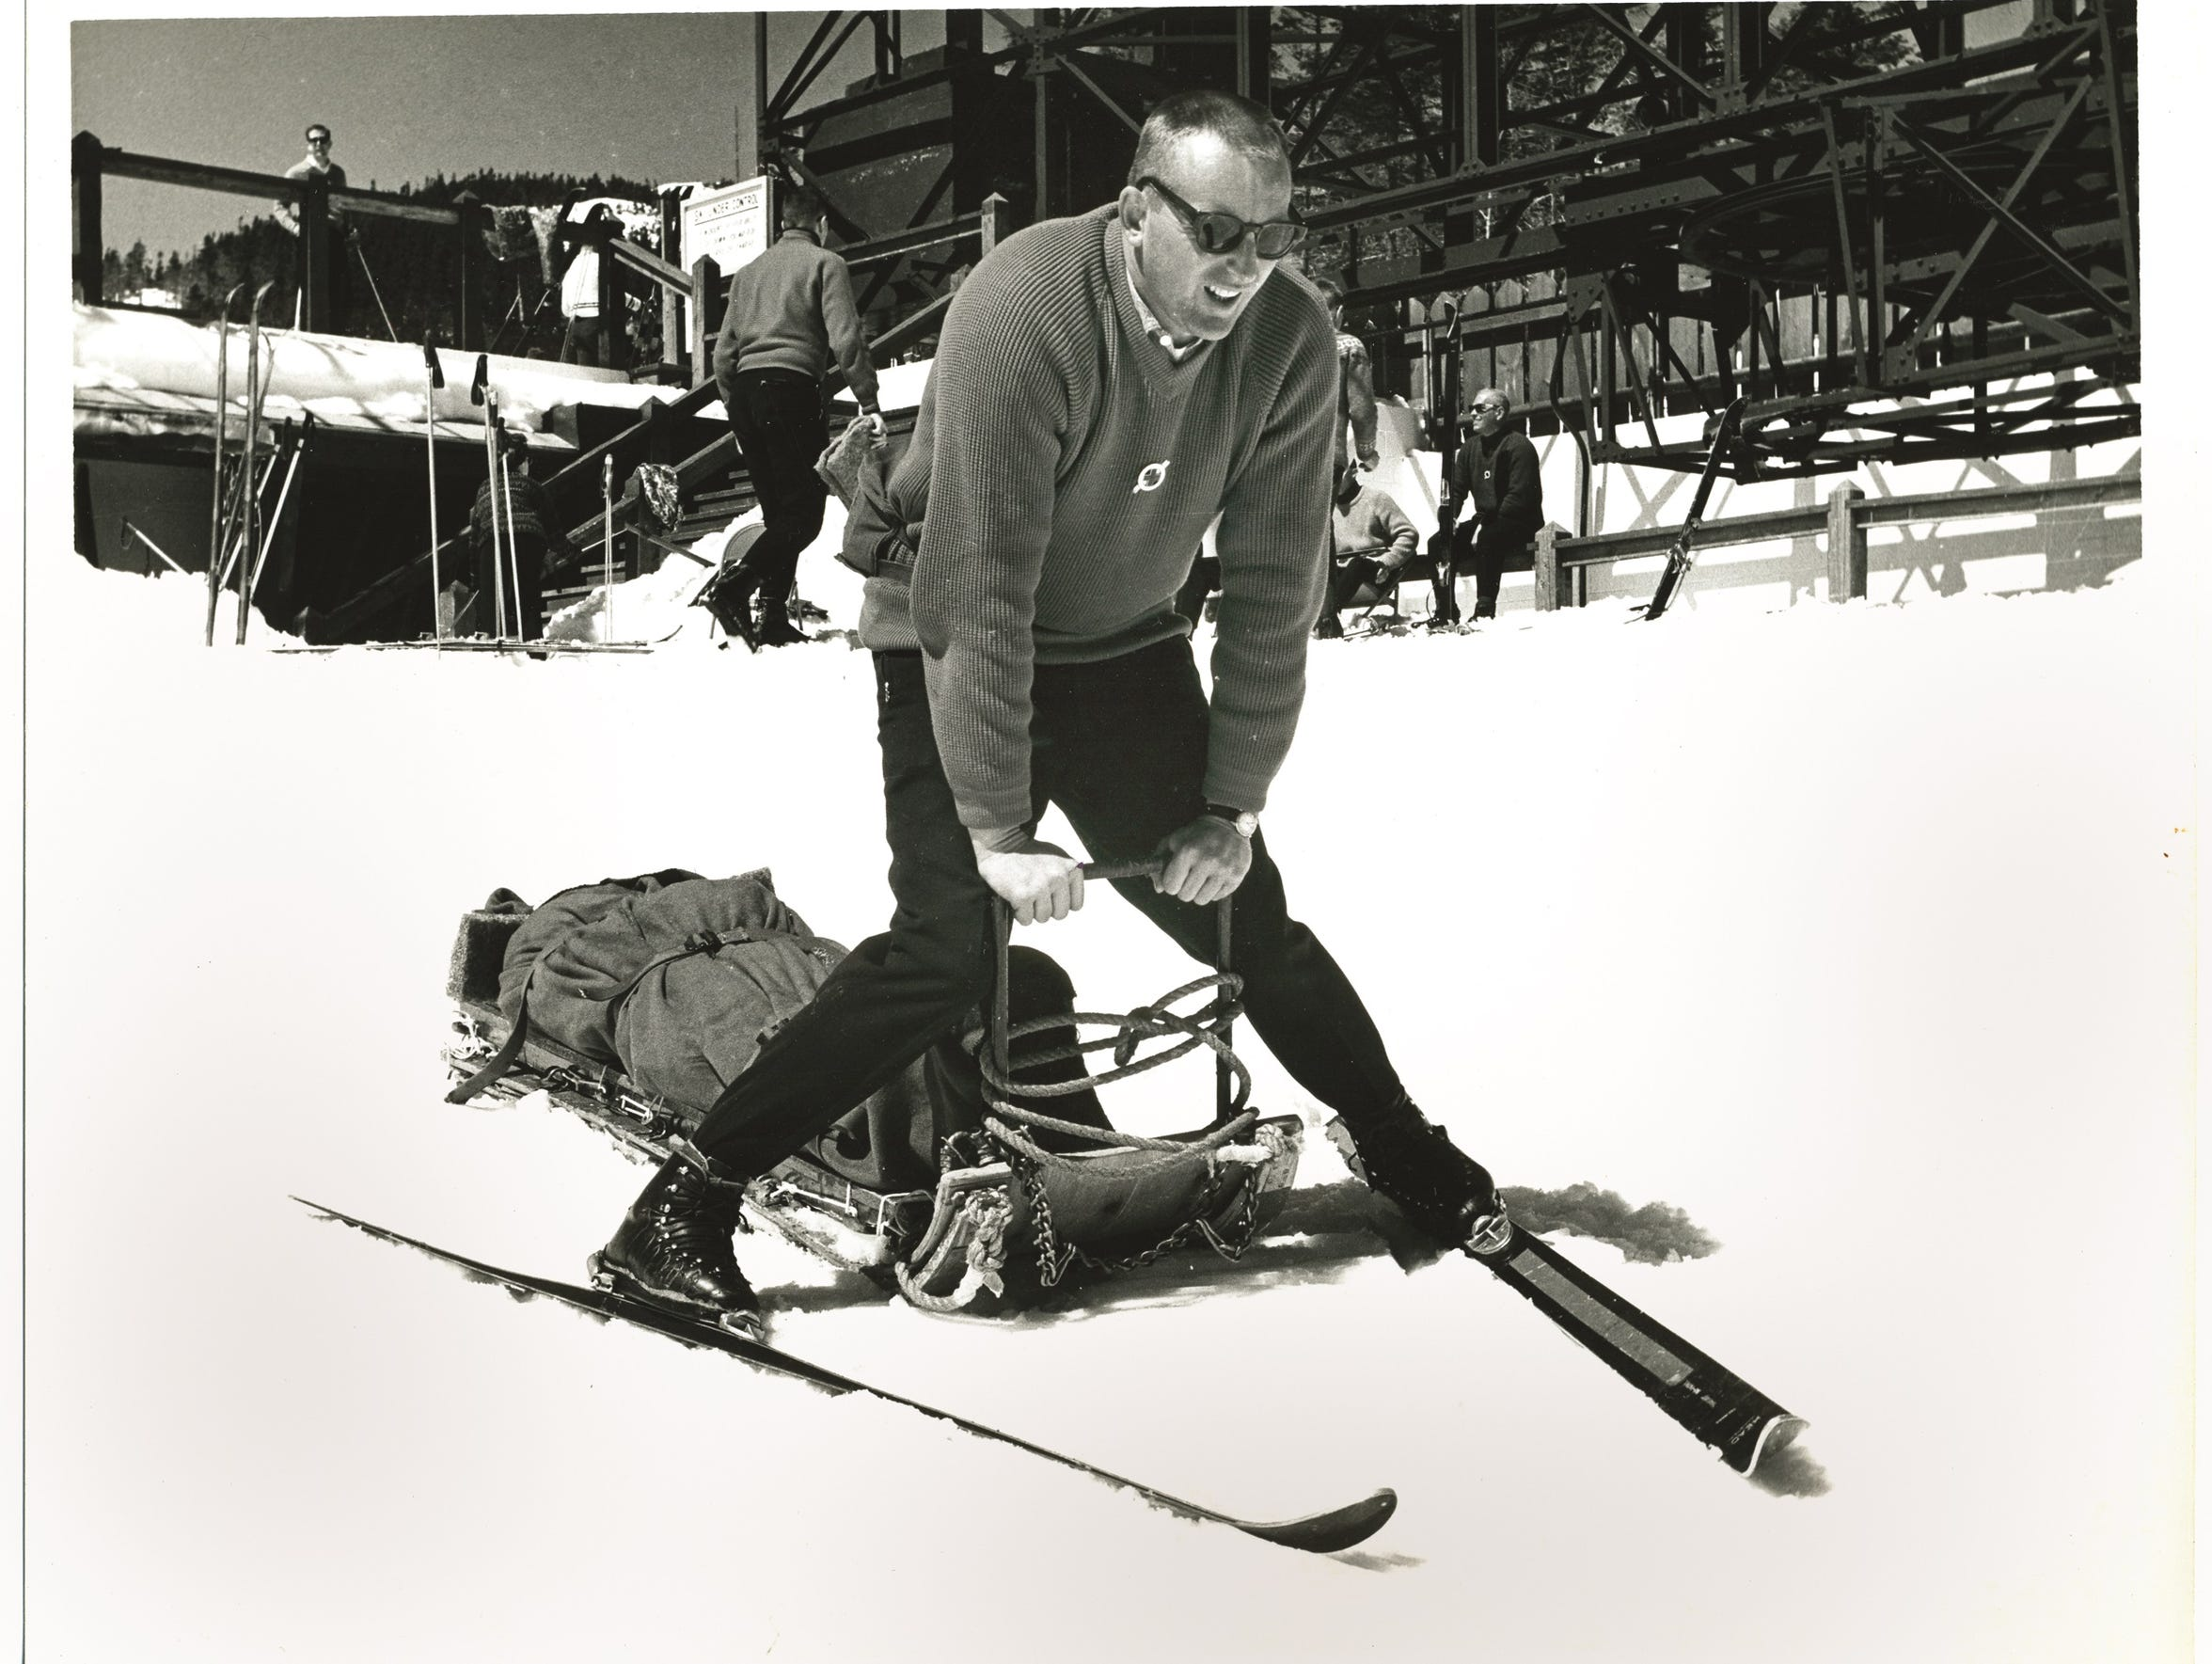 Photo circa 1965 shows longtime ski patroller Clarence